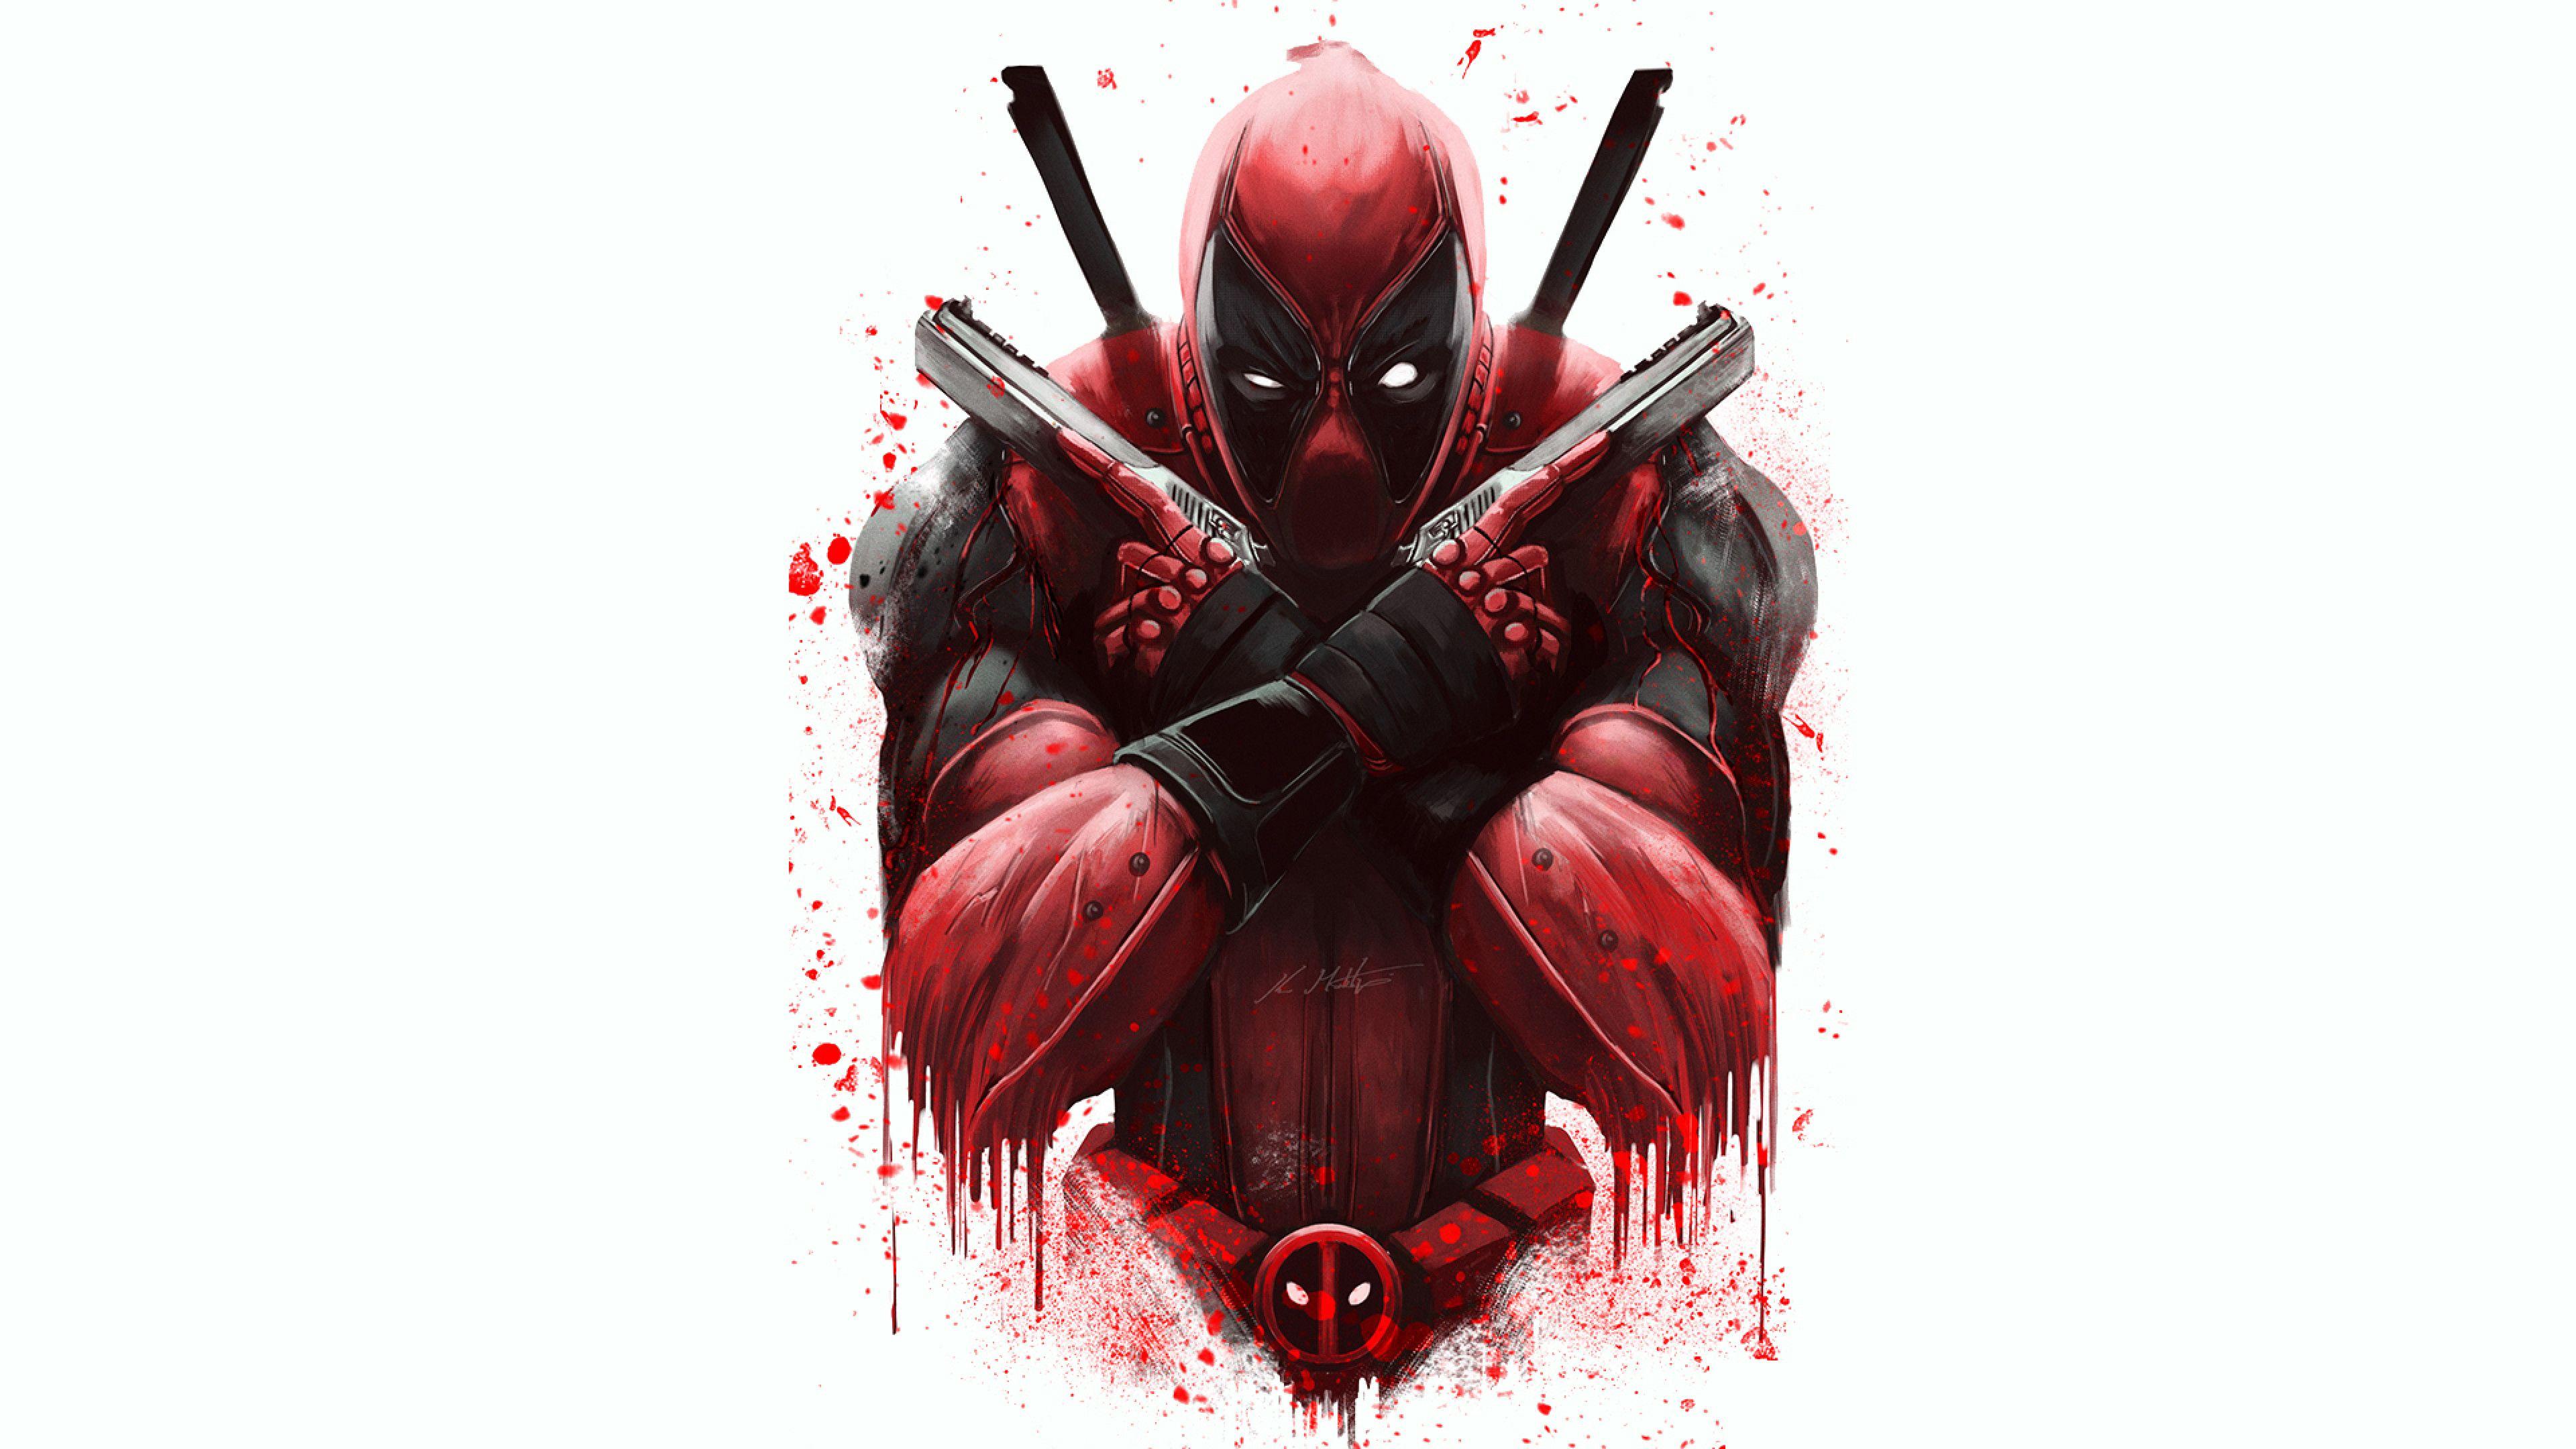 70 4k Deadpool Wallpapers On Wallpaperplay In 2020 Deadpool Wallpaper Deadpool Movie Wallpaper Deadpool